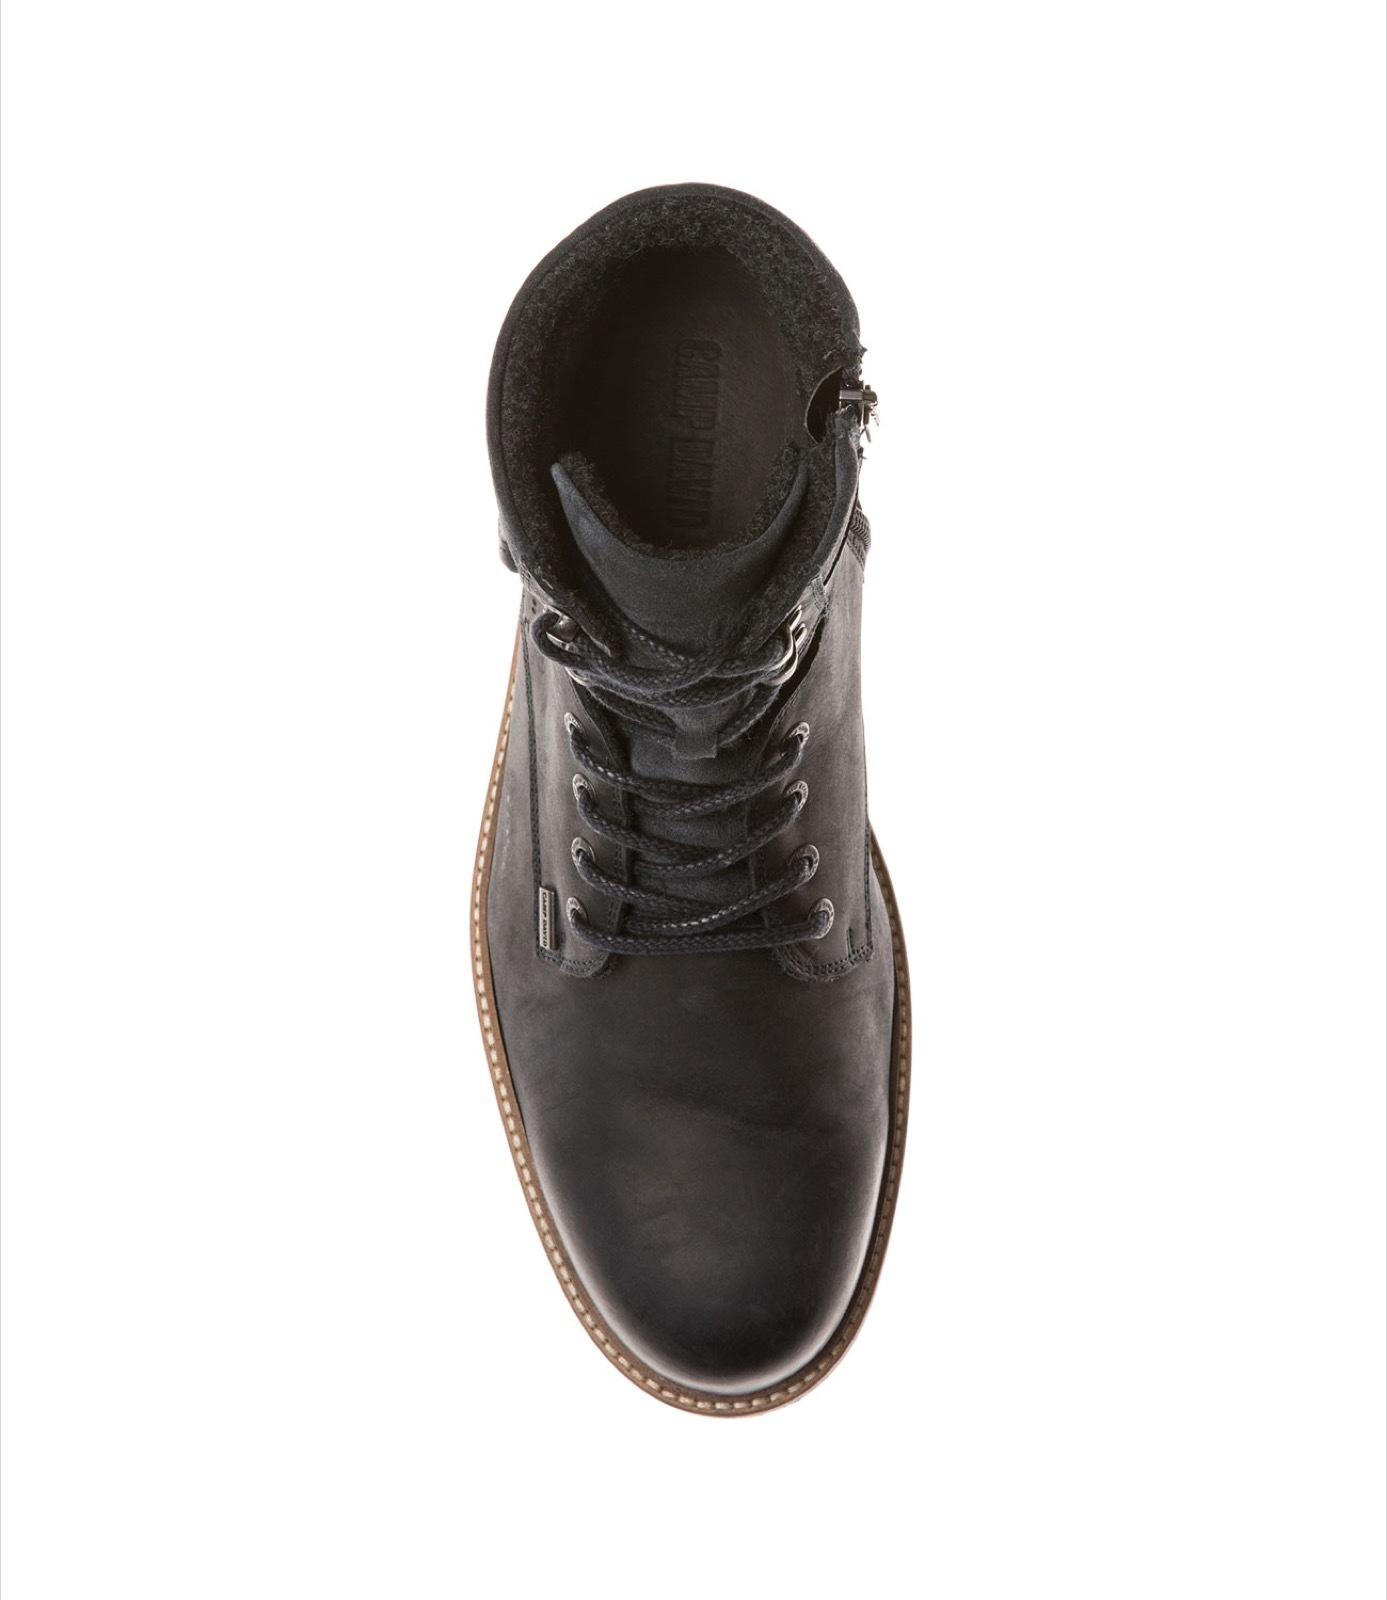 Premium Leder-Stiefel mit Logo-Applikation